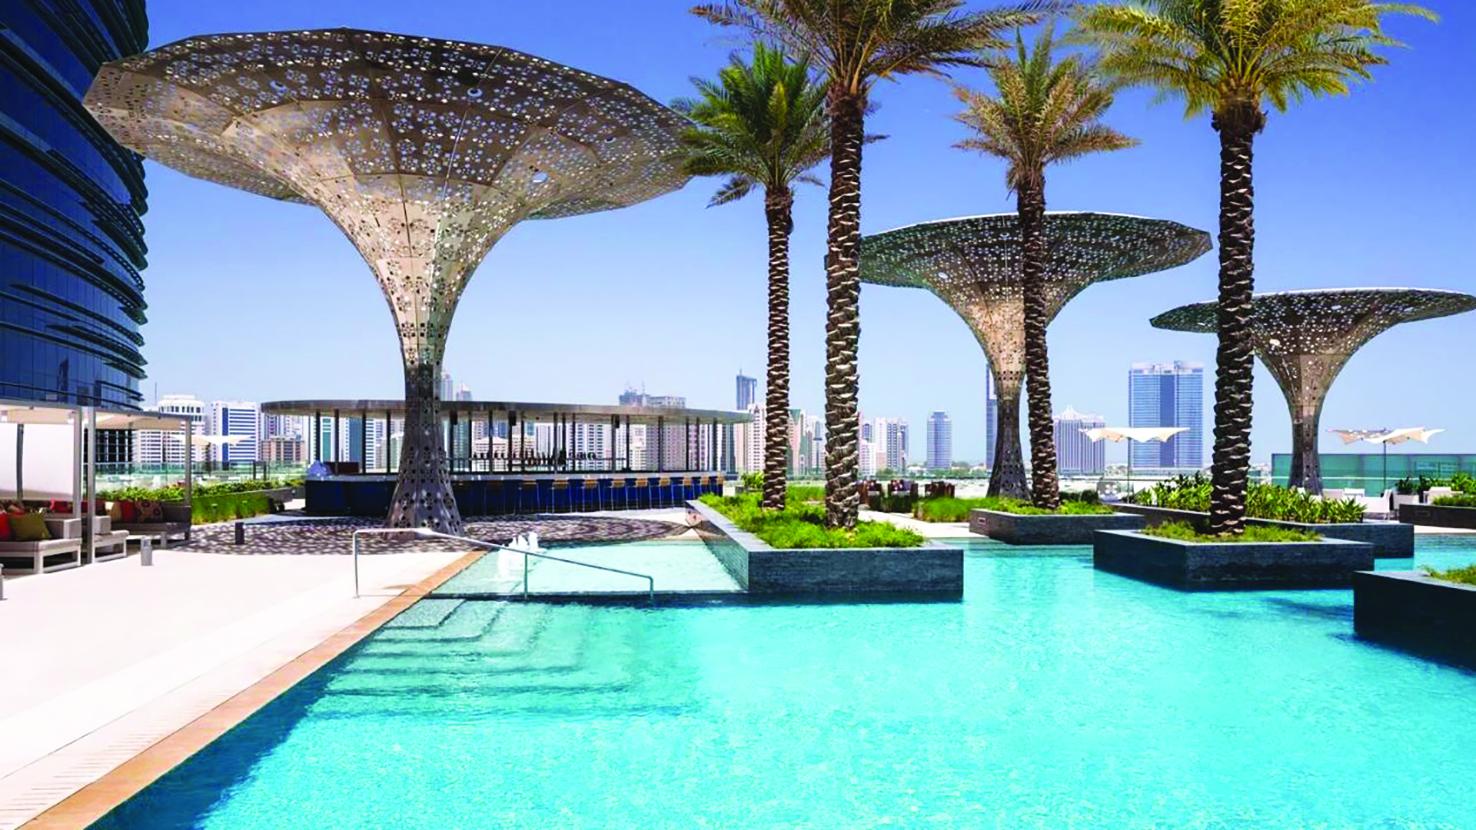 Abu Dhabi Rosewood Hotel Abu Dhabi